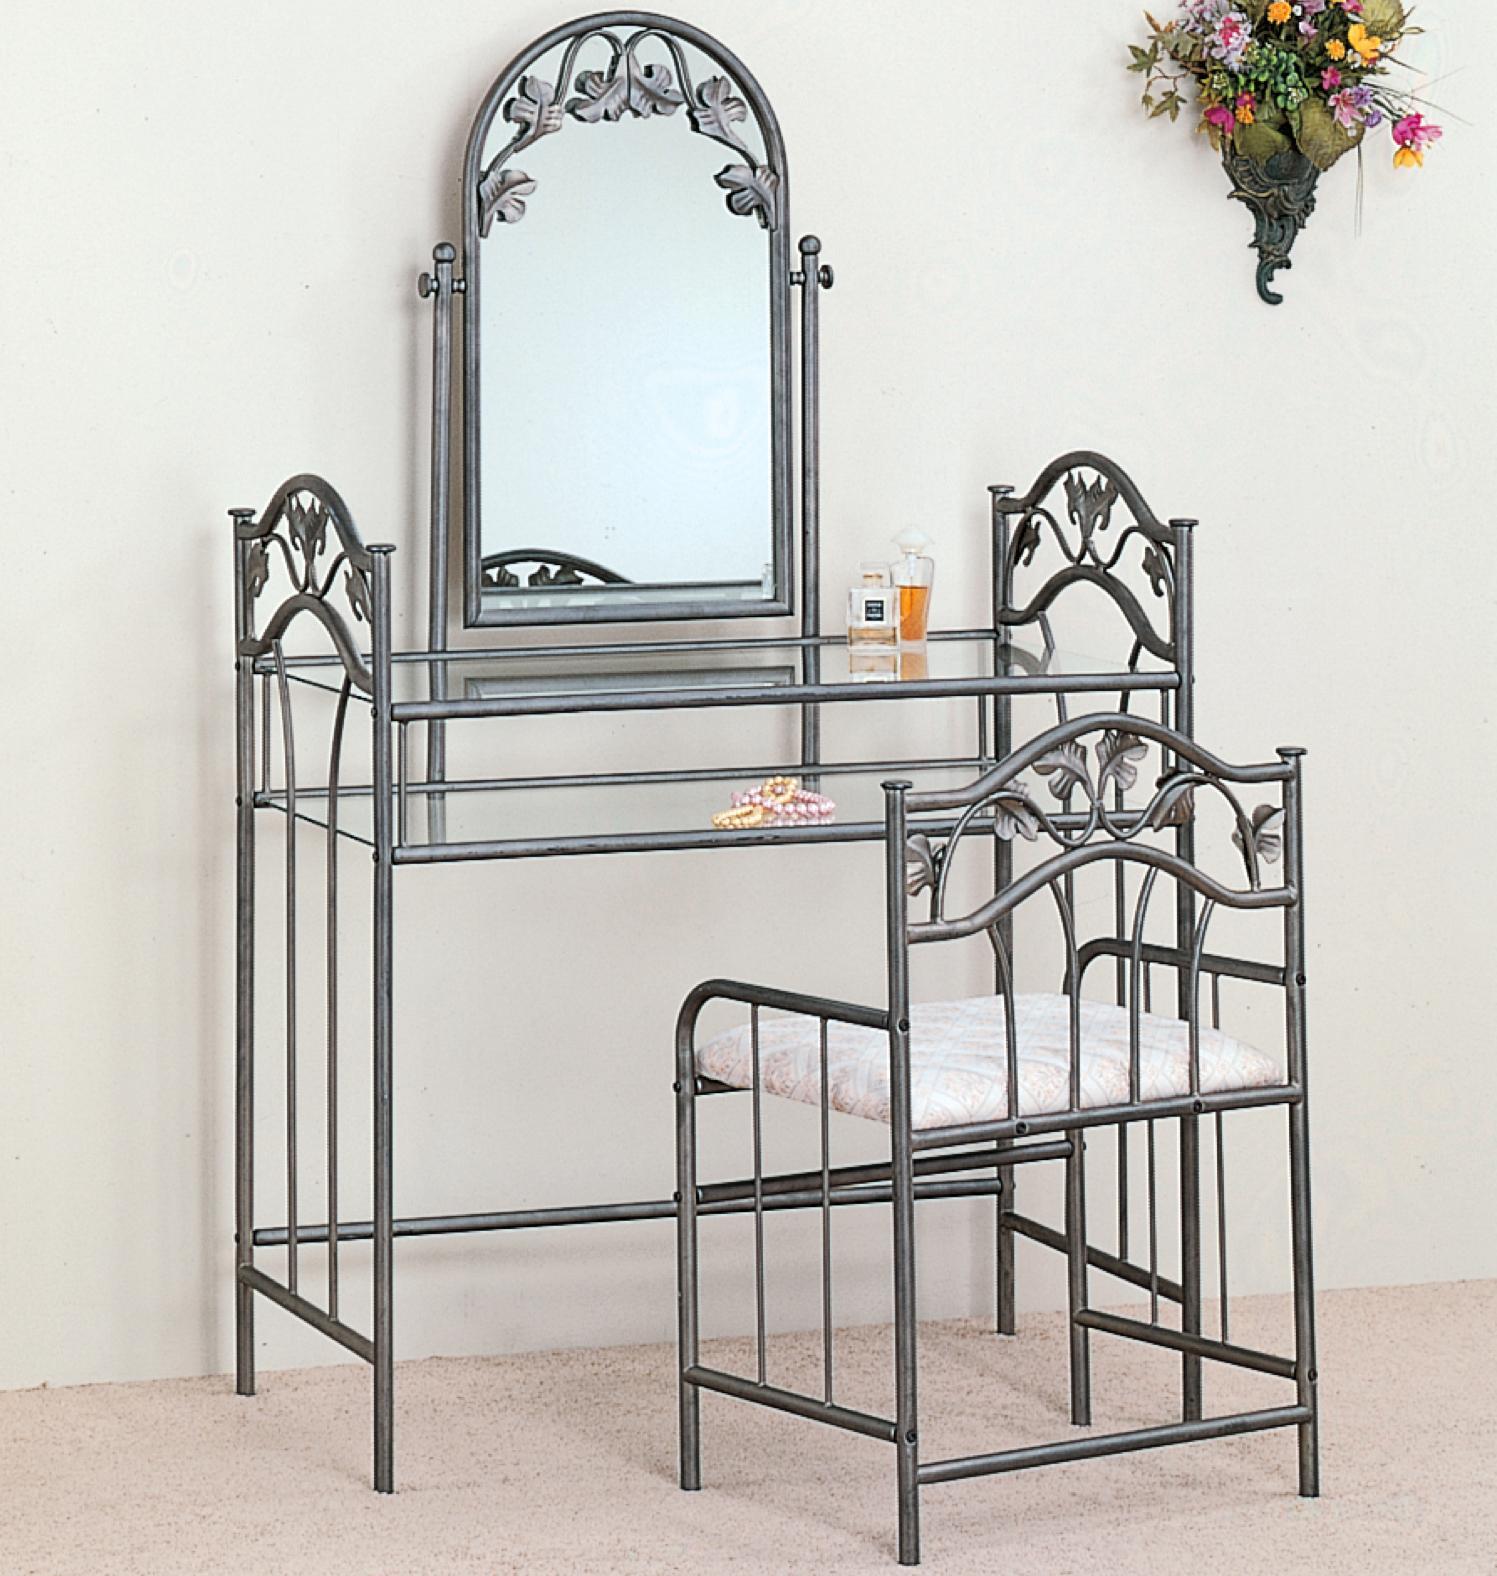 Camila Vanity   Stool SetCamila Vanity   Stool Set   Coco Furniture Gallery Furnishing Dreams. White Metal Vanity Set. Home Design Ideas